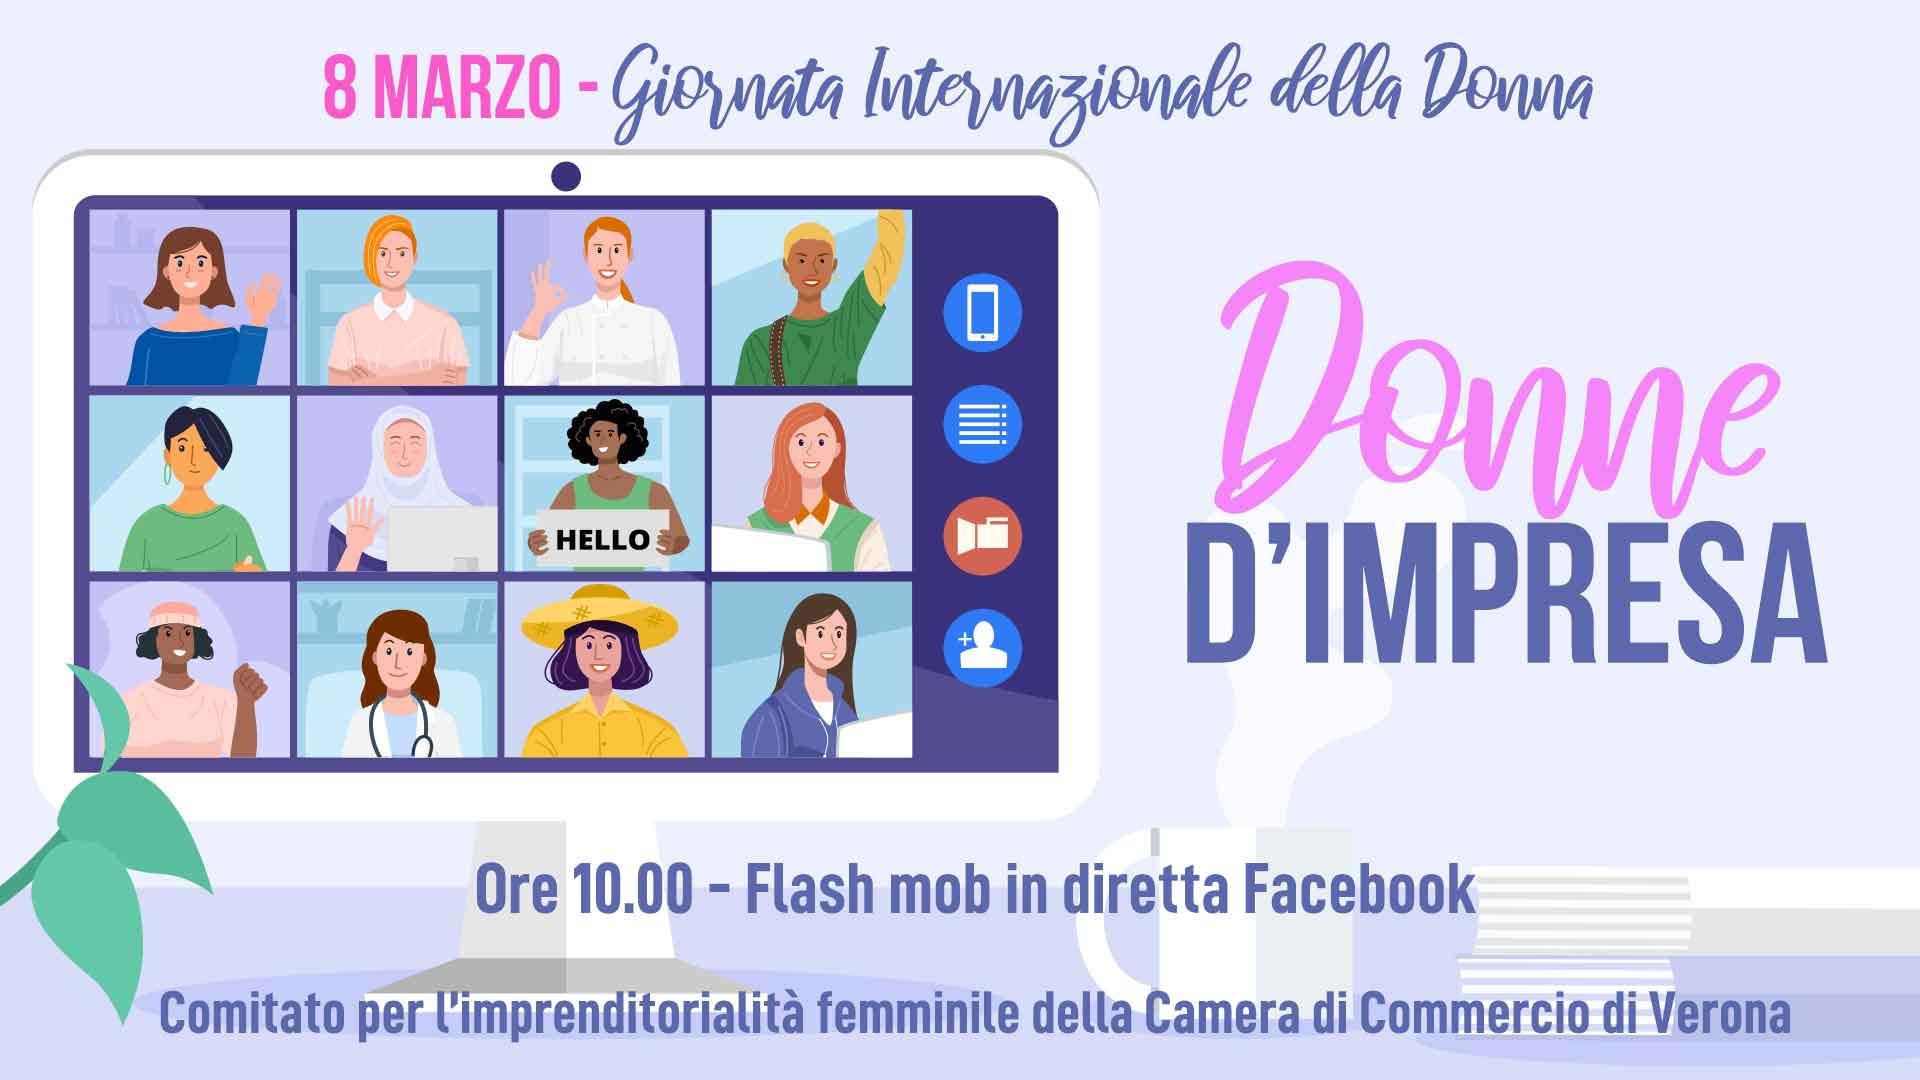 DONNE – Lunedì 8 marzo, ore 10 su Facebook: Donne d'Impresa, flash mob per l'imprenditorialità femminile